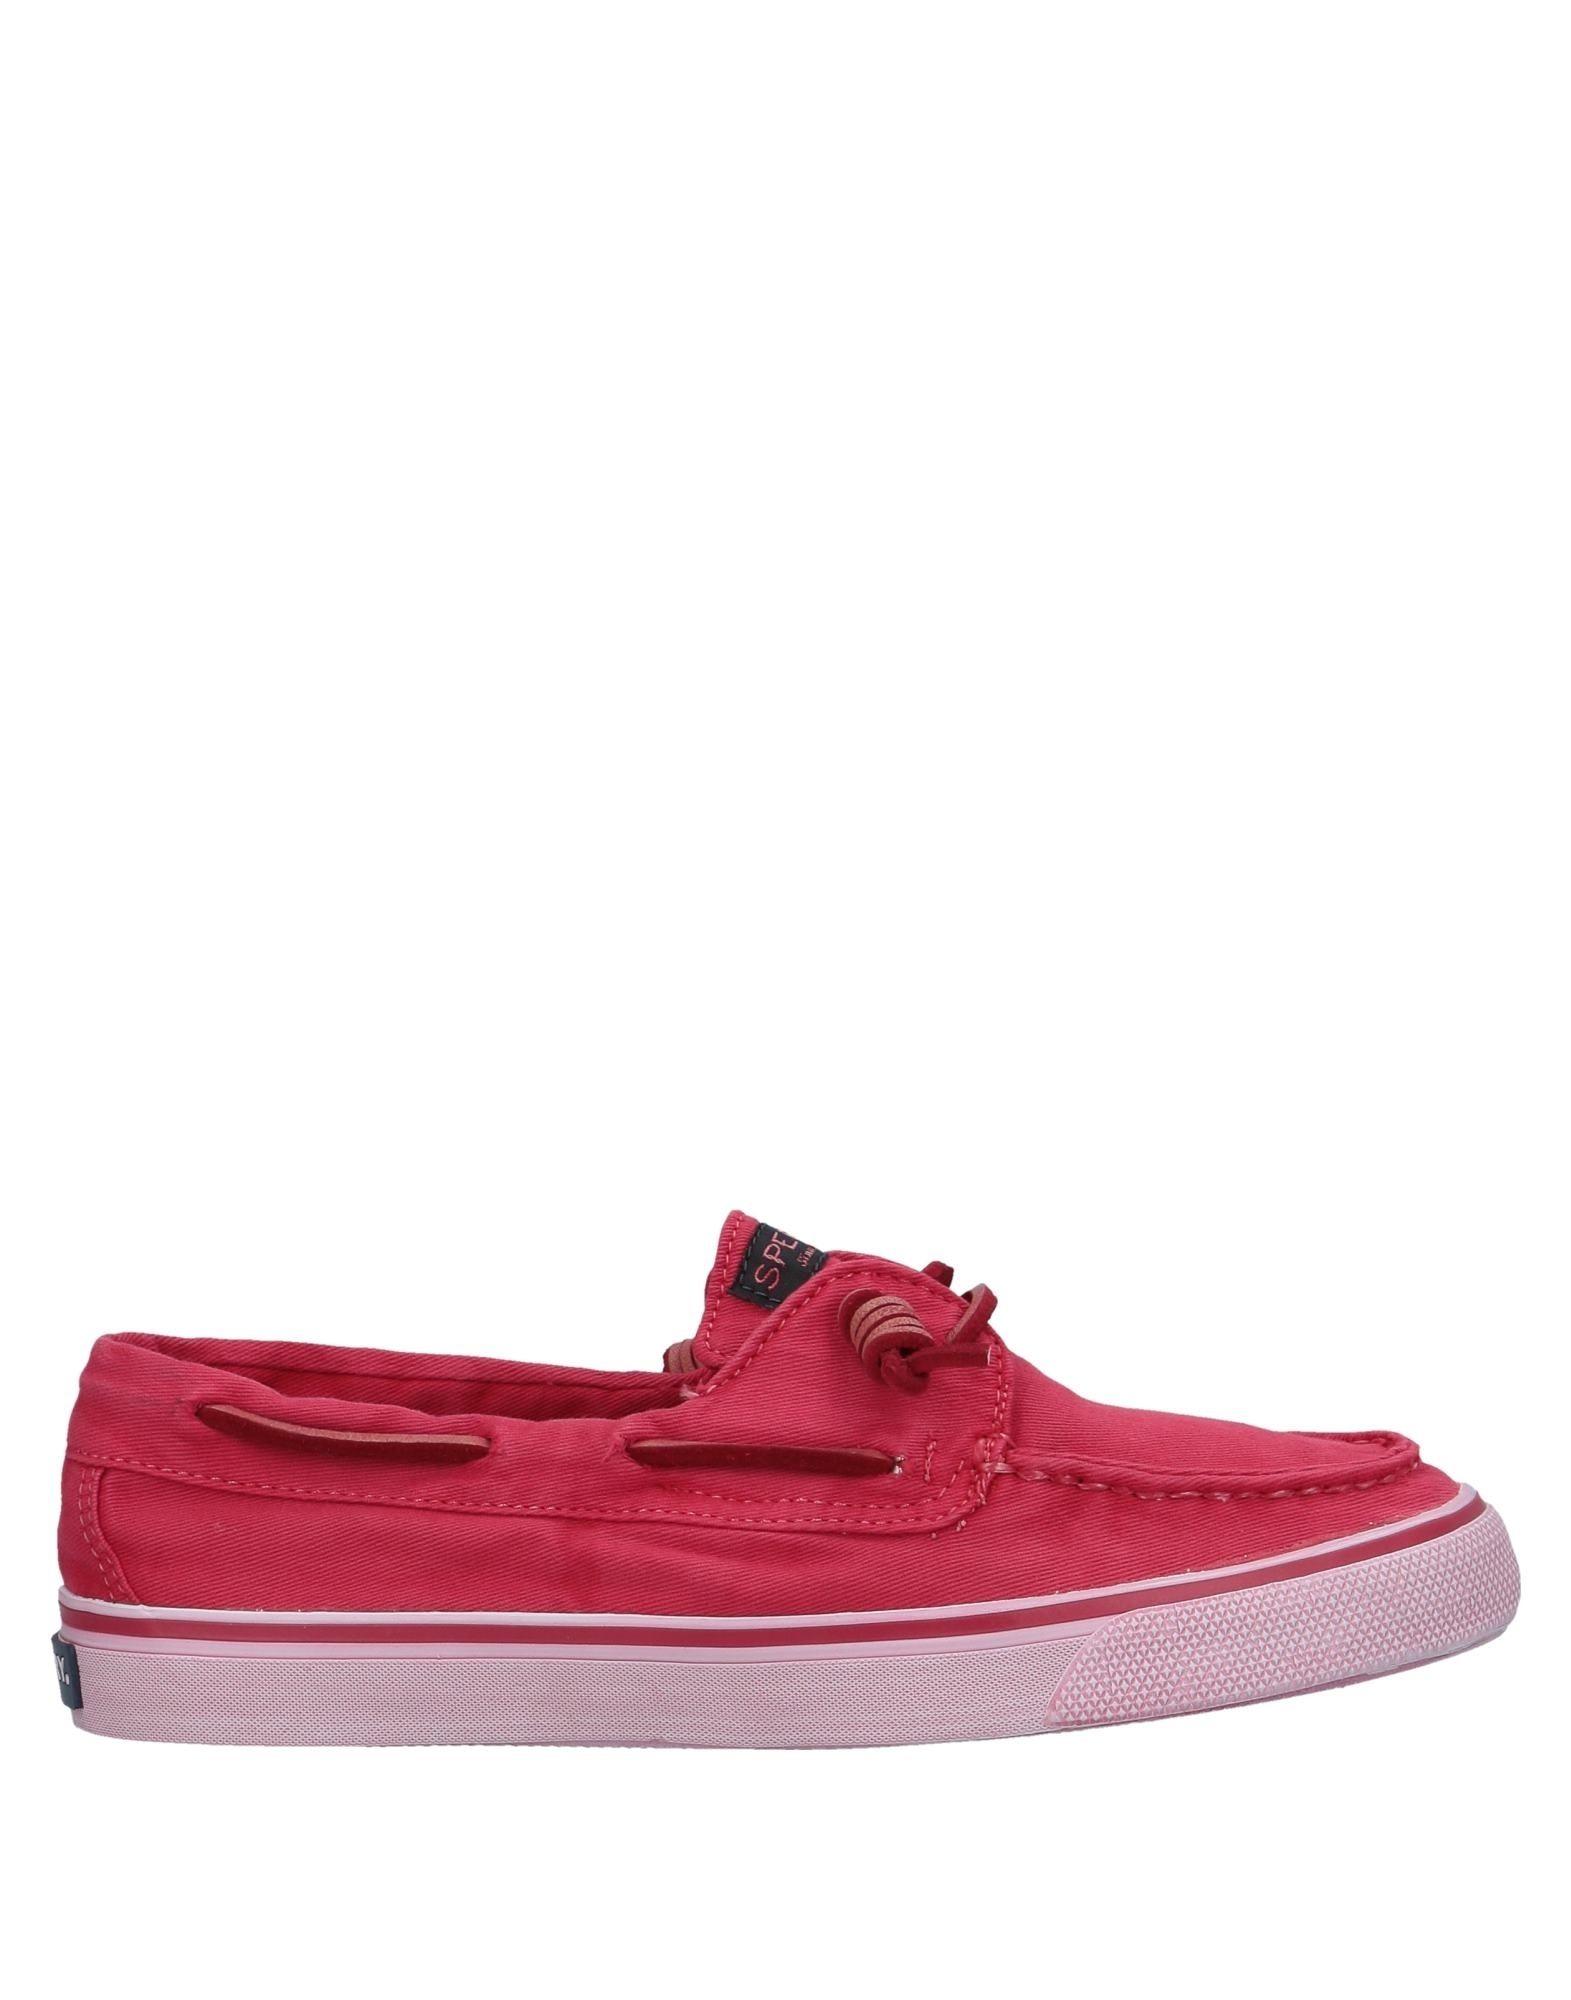 Sperry Top-Sider Loafers - Women Sperry Top-Sider Loafers online 11527928BI on  Australia - 11527928BI online 35cbe5